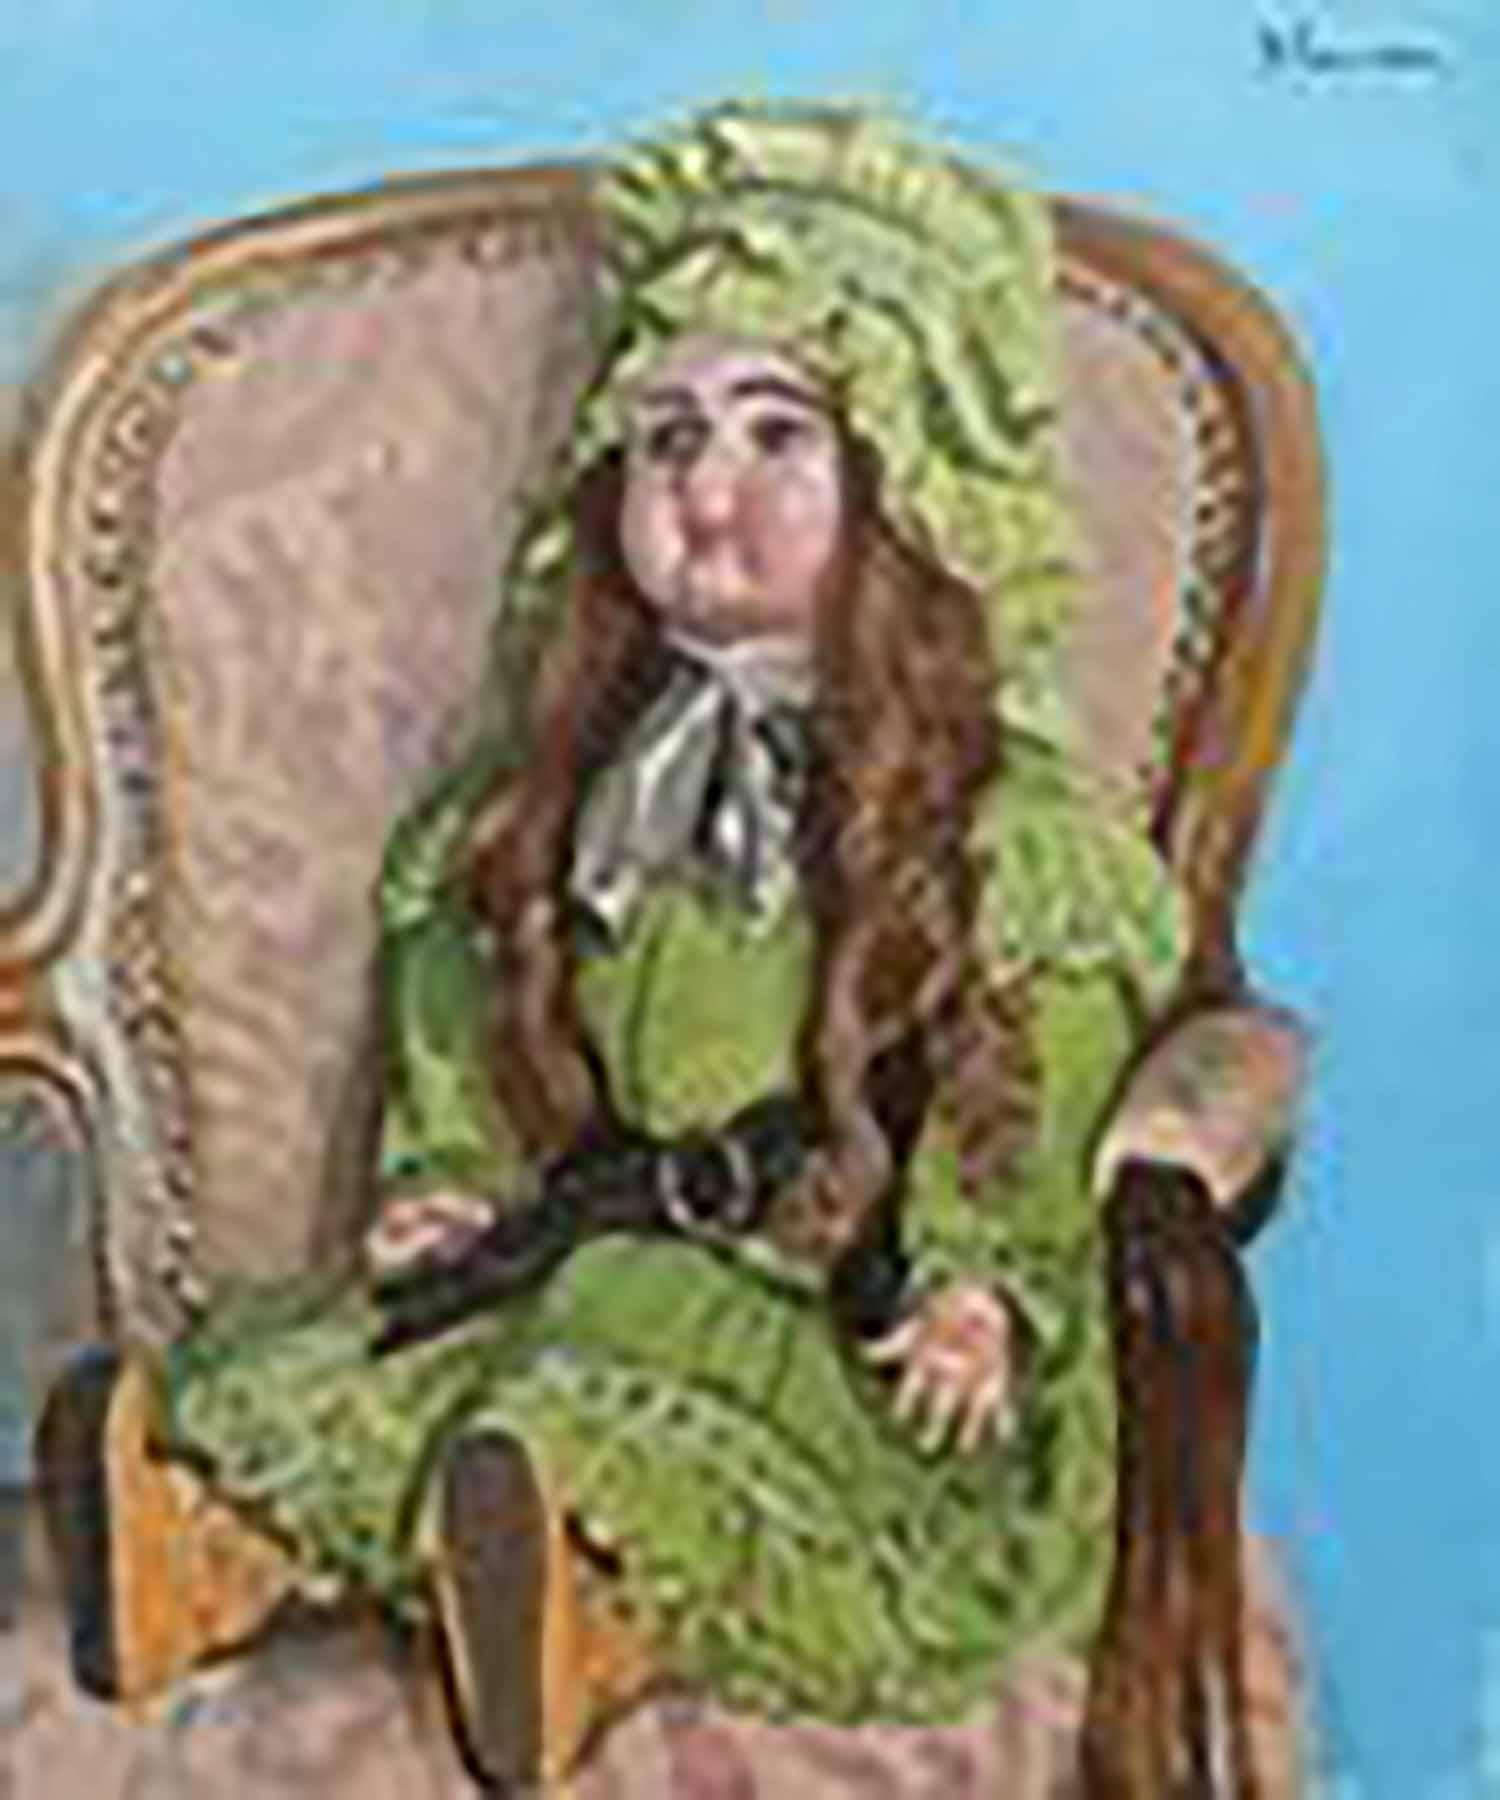 田村孝之介 椅子の人形